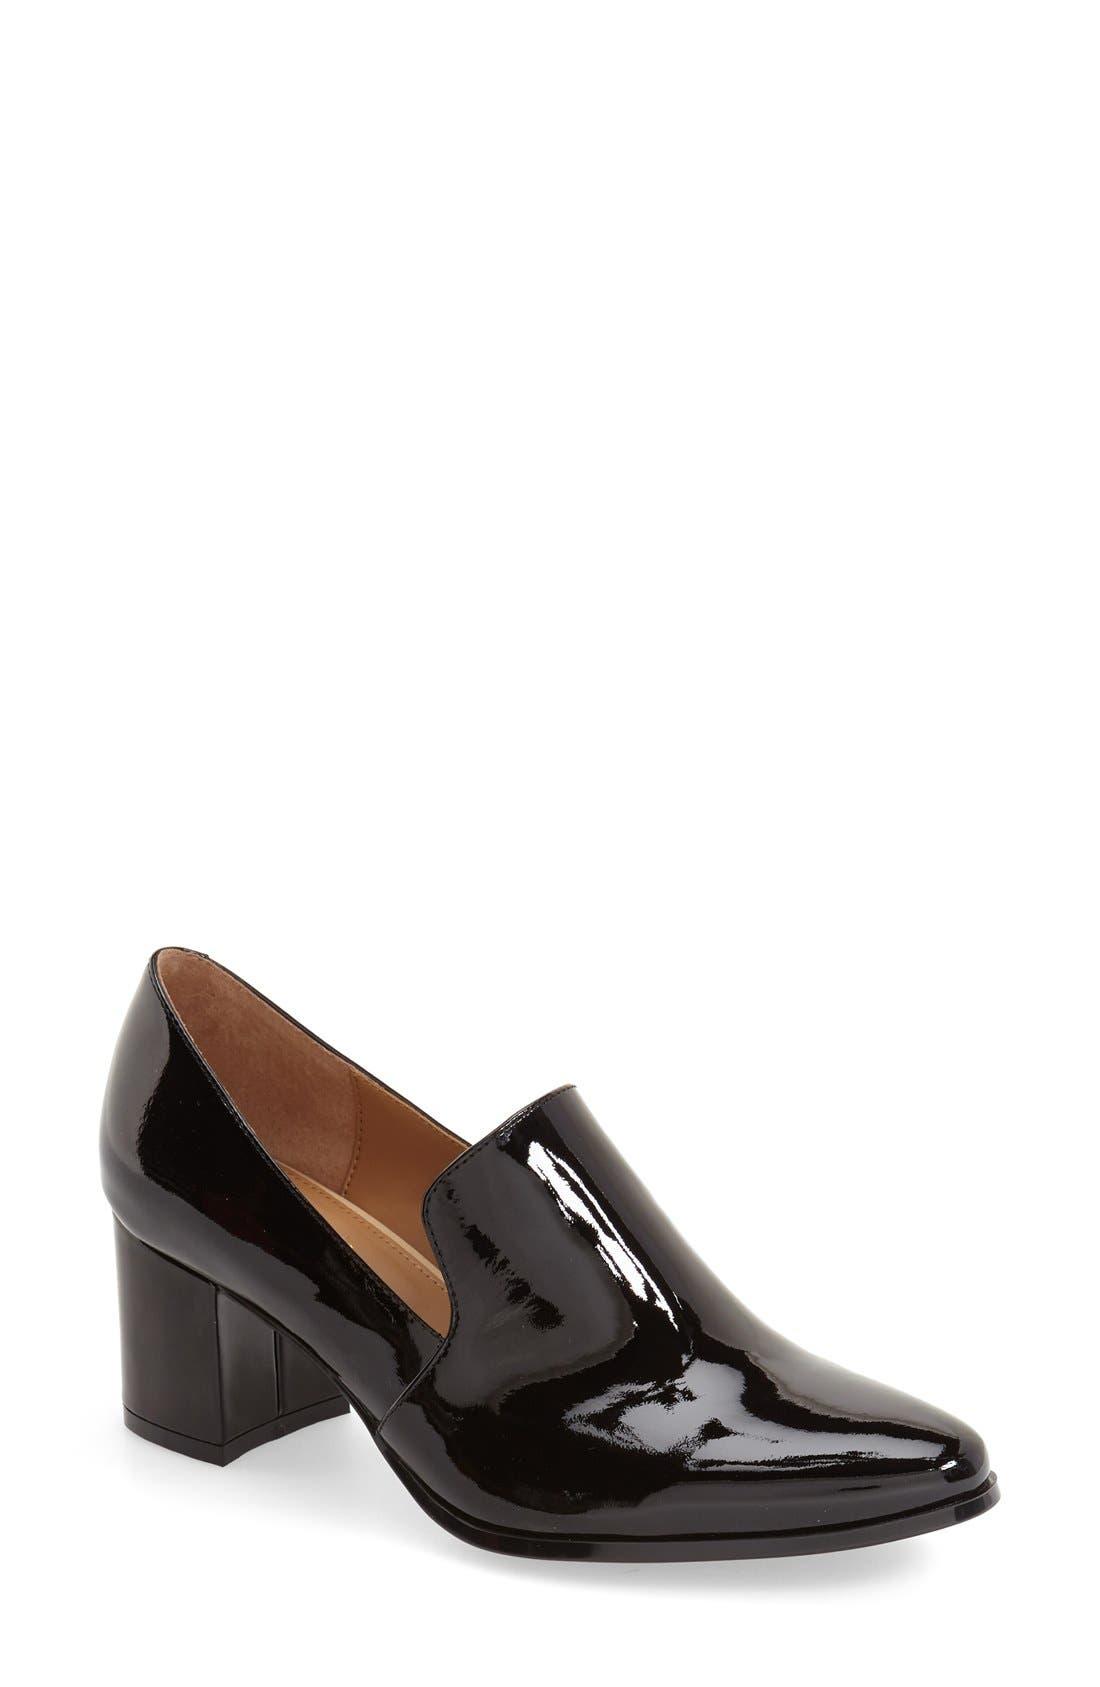 Main Image - Calvin Klein 'Faye' Block Heel Pump (Women)